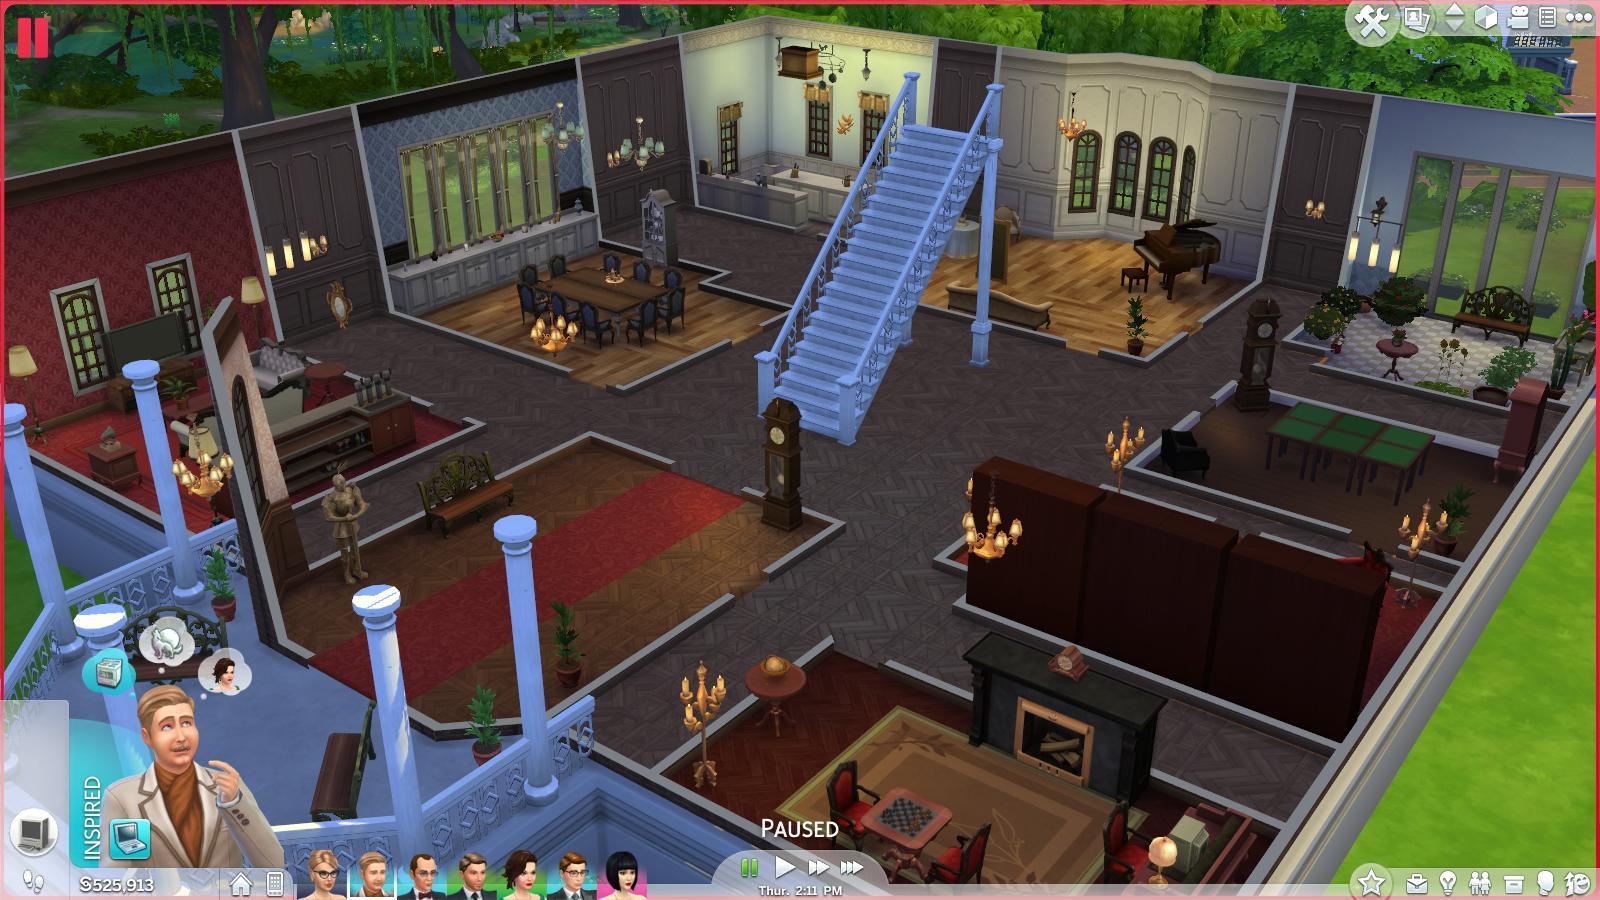 Les Sims 4 Le Manoir De Cluedo Game Guide